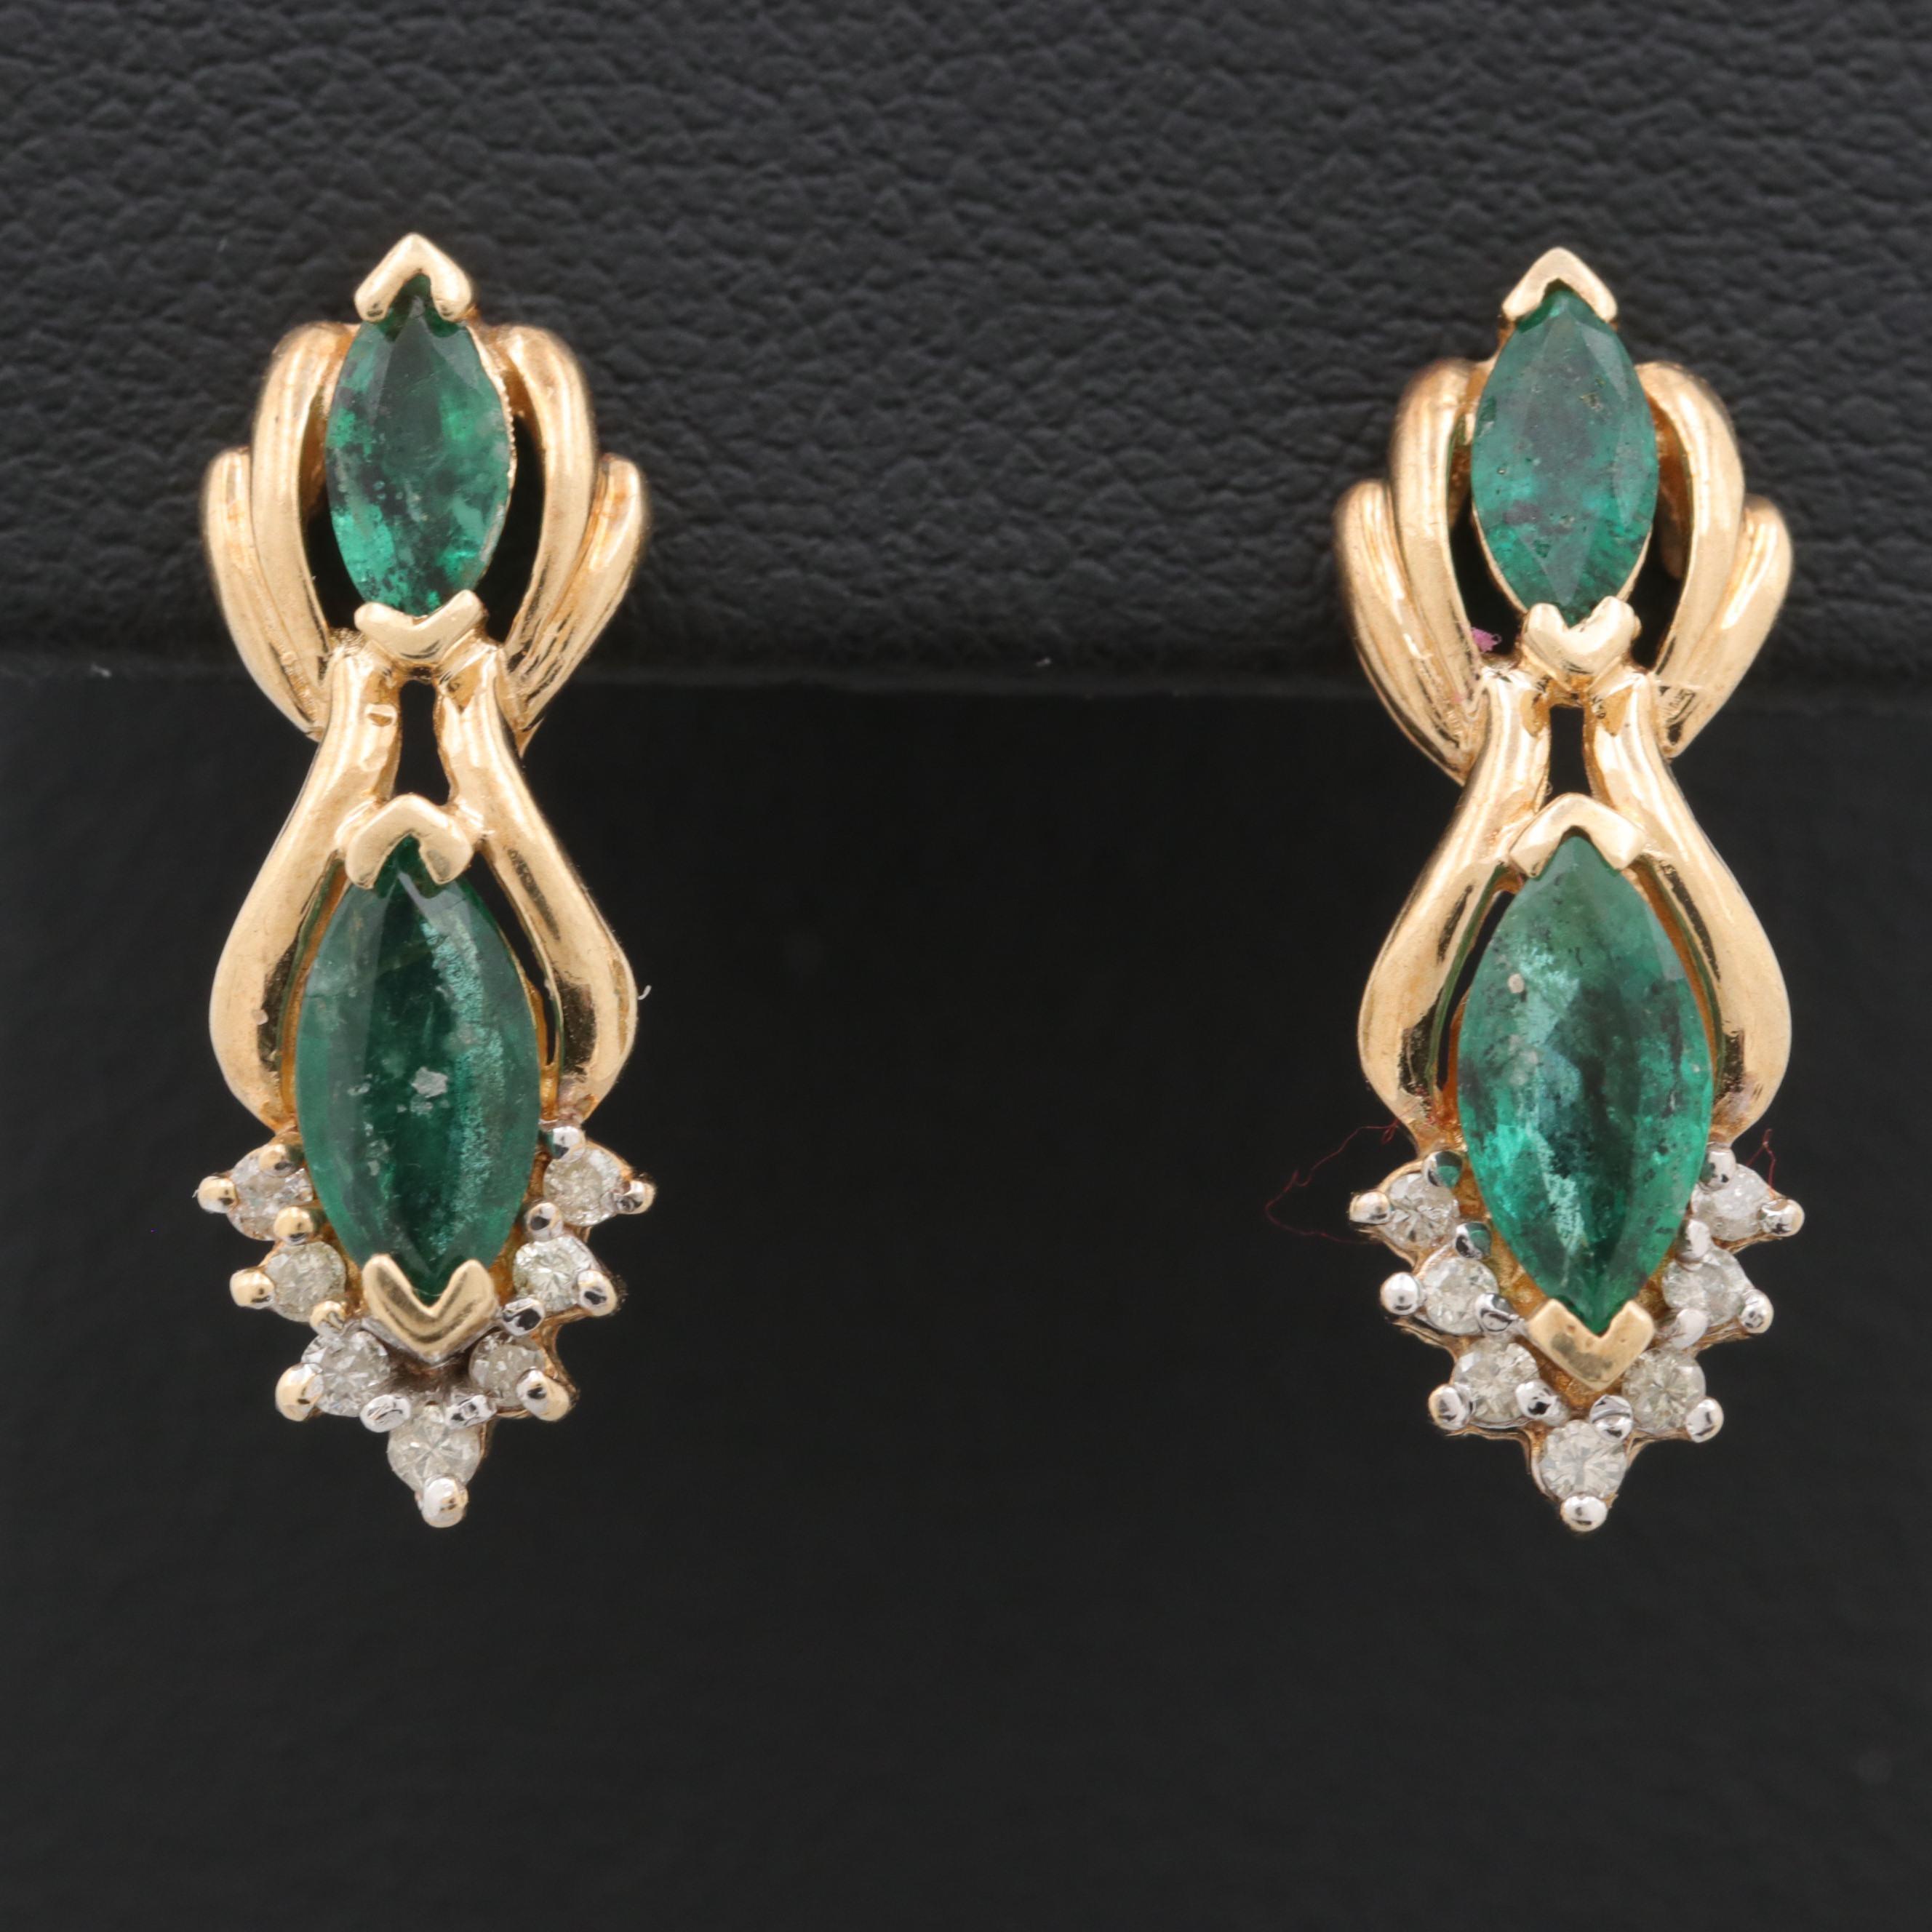 10K Yellow Gold Synthetic Emerald and Diamond Earrings